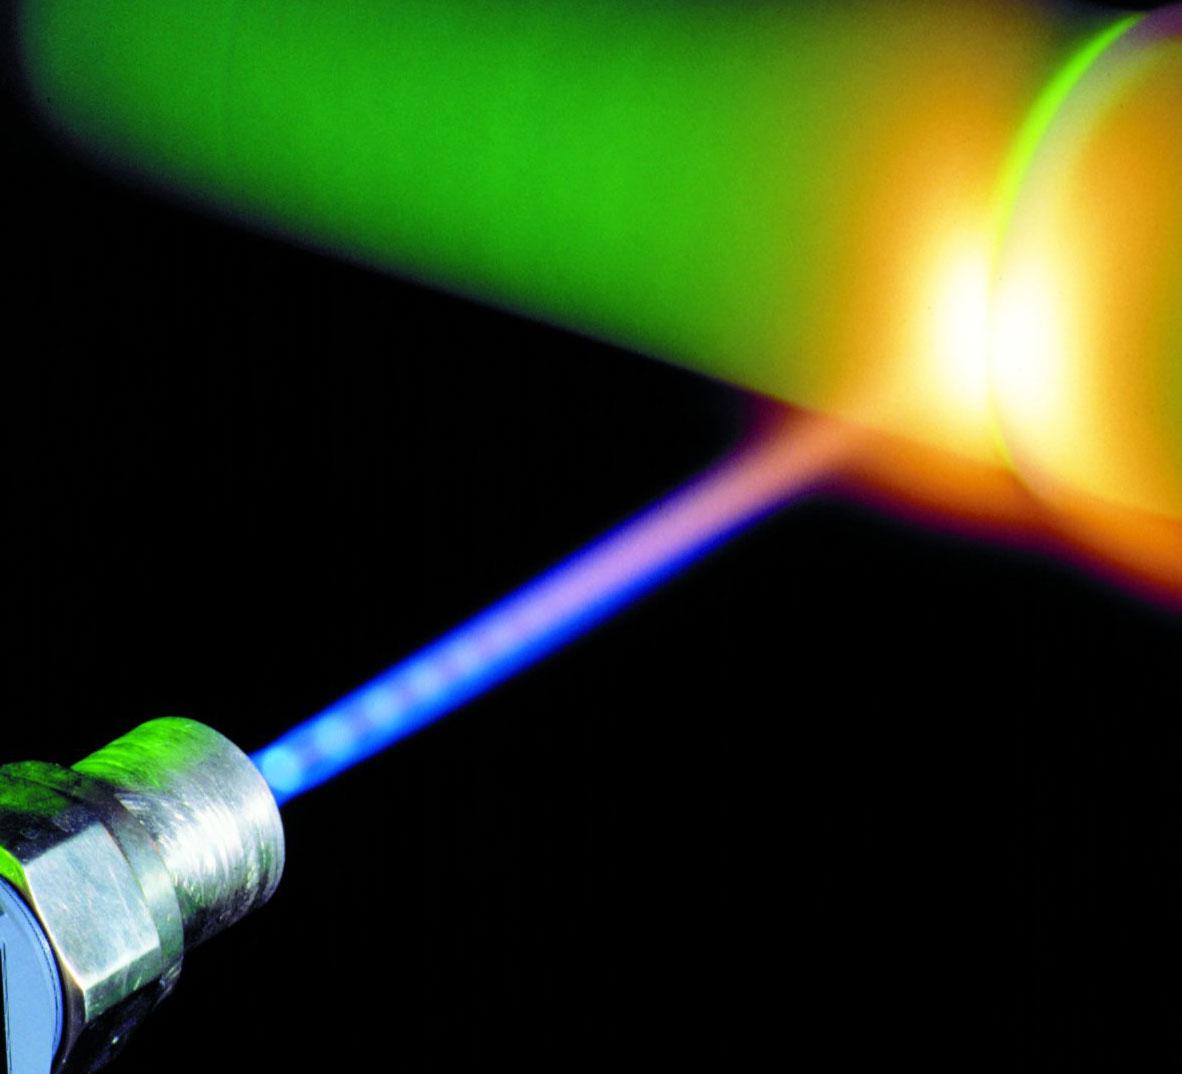 http://2.bp.blogspot.com/_ywR-FG6vfmI/TDOcWKpcdjI/AAAAAAAAKP8/SgLJGDdUkMI/s1600/laser1.jpg